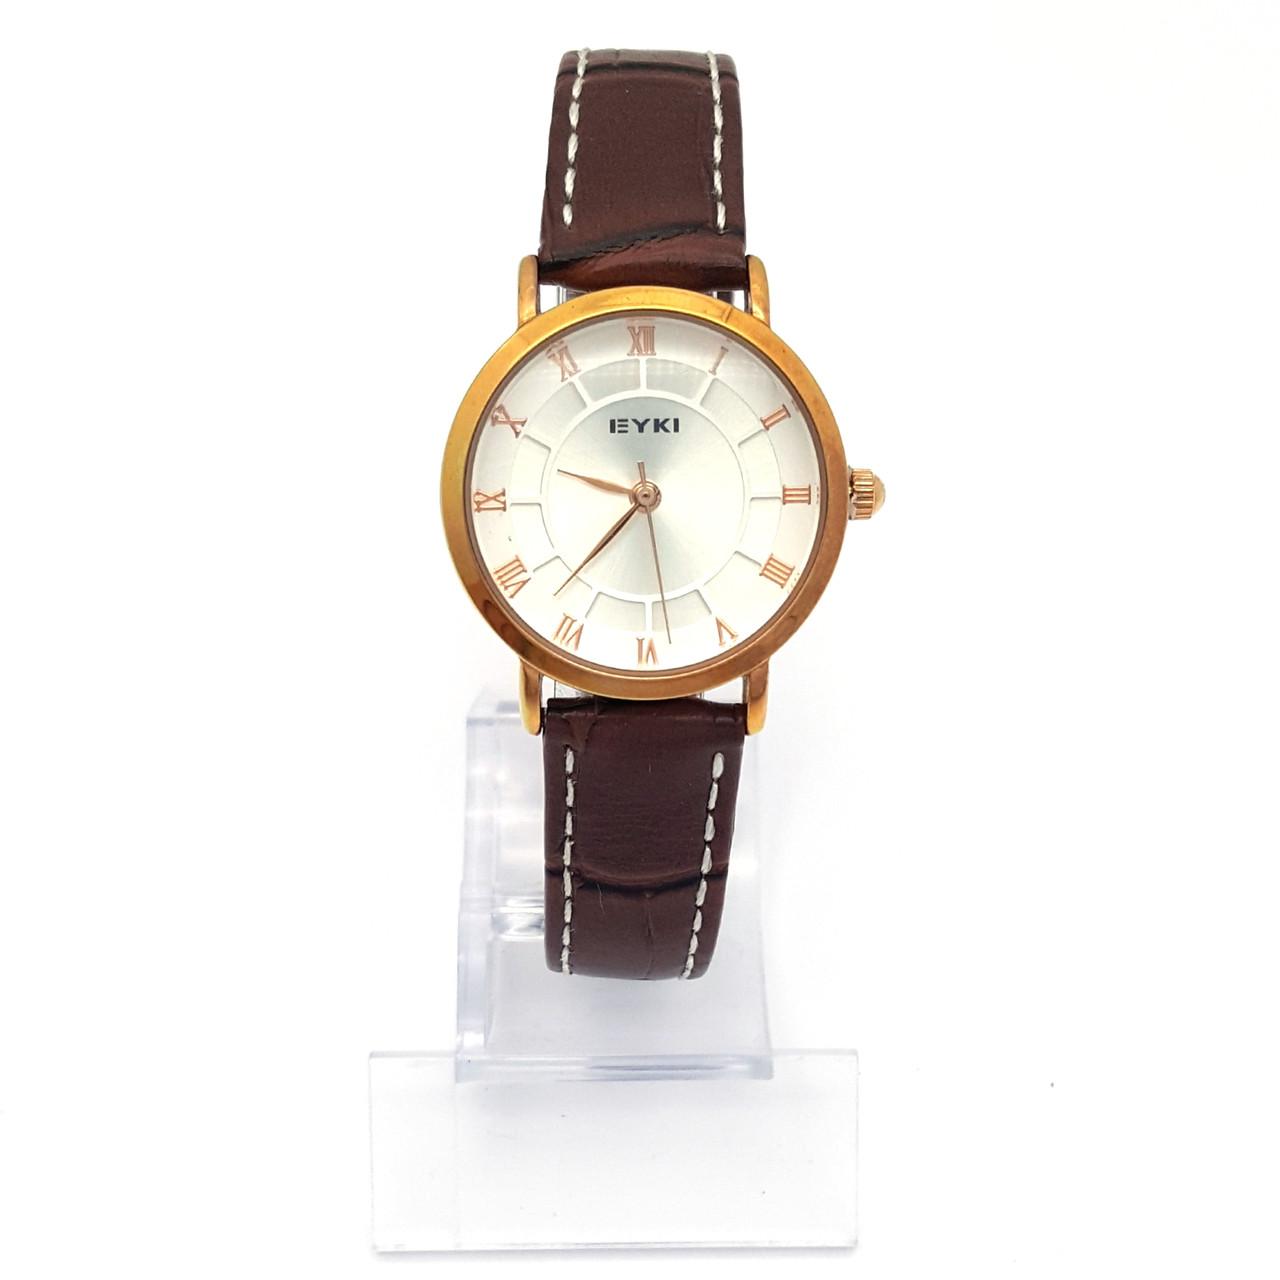 Часы EYKI Золотистые, на коричневом ремешке, длина ремешка 15-19см, циферблат 28мм